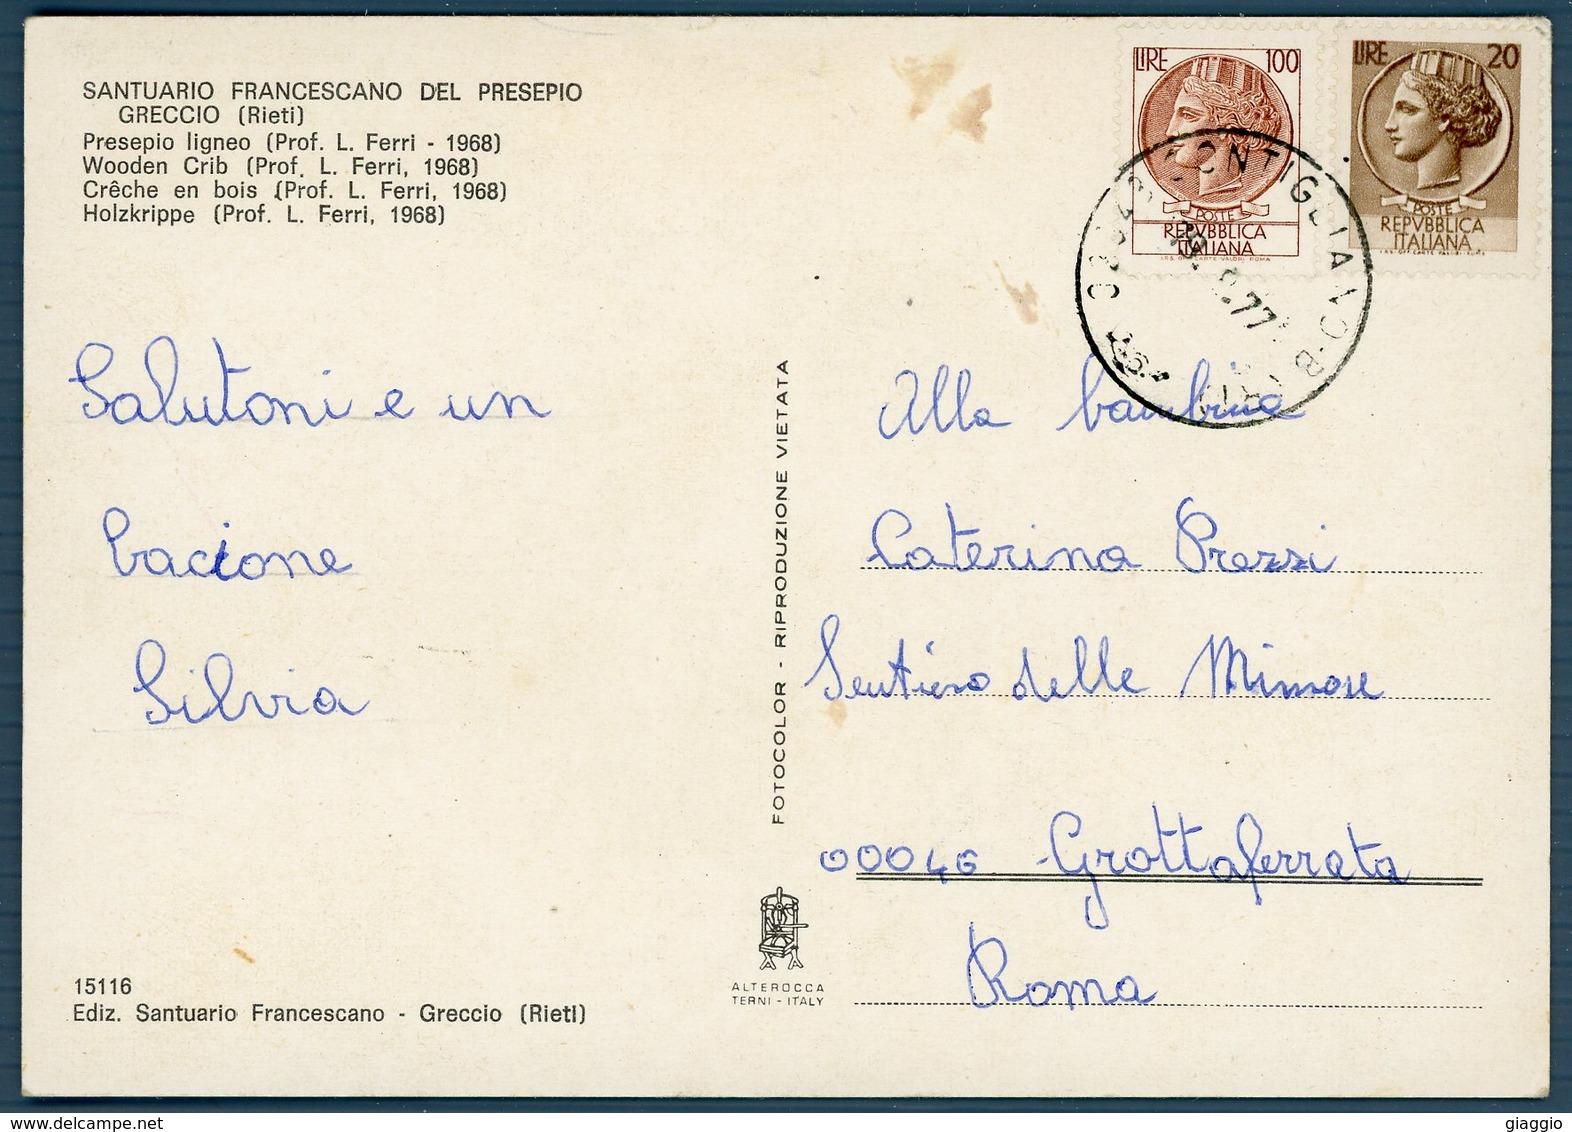 °°° Cartolina N.14 Santuario Francescano Del Presepio Greccio Viaggiata °°° - Rieti